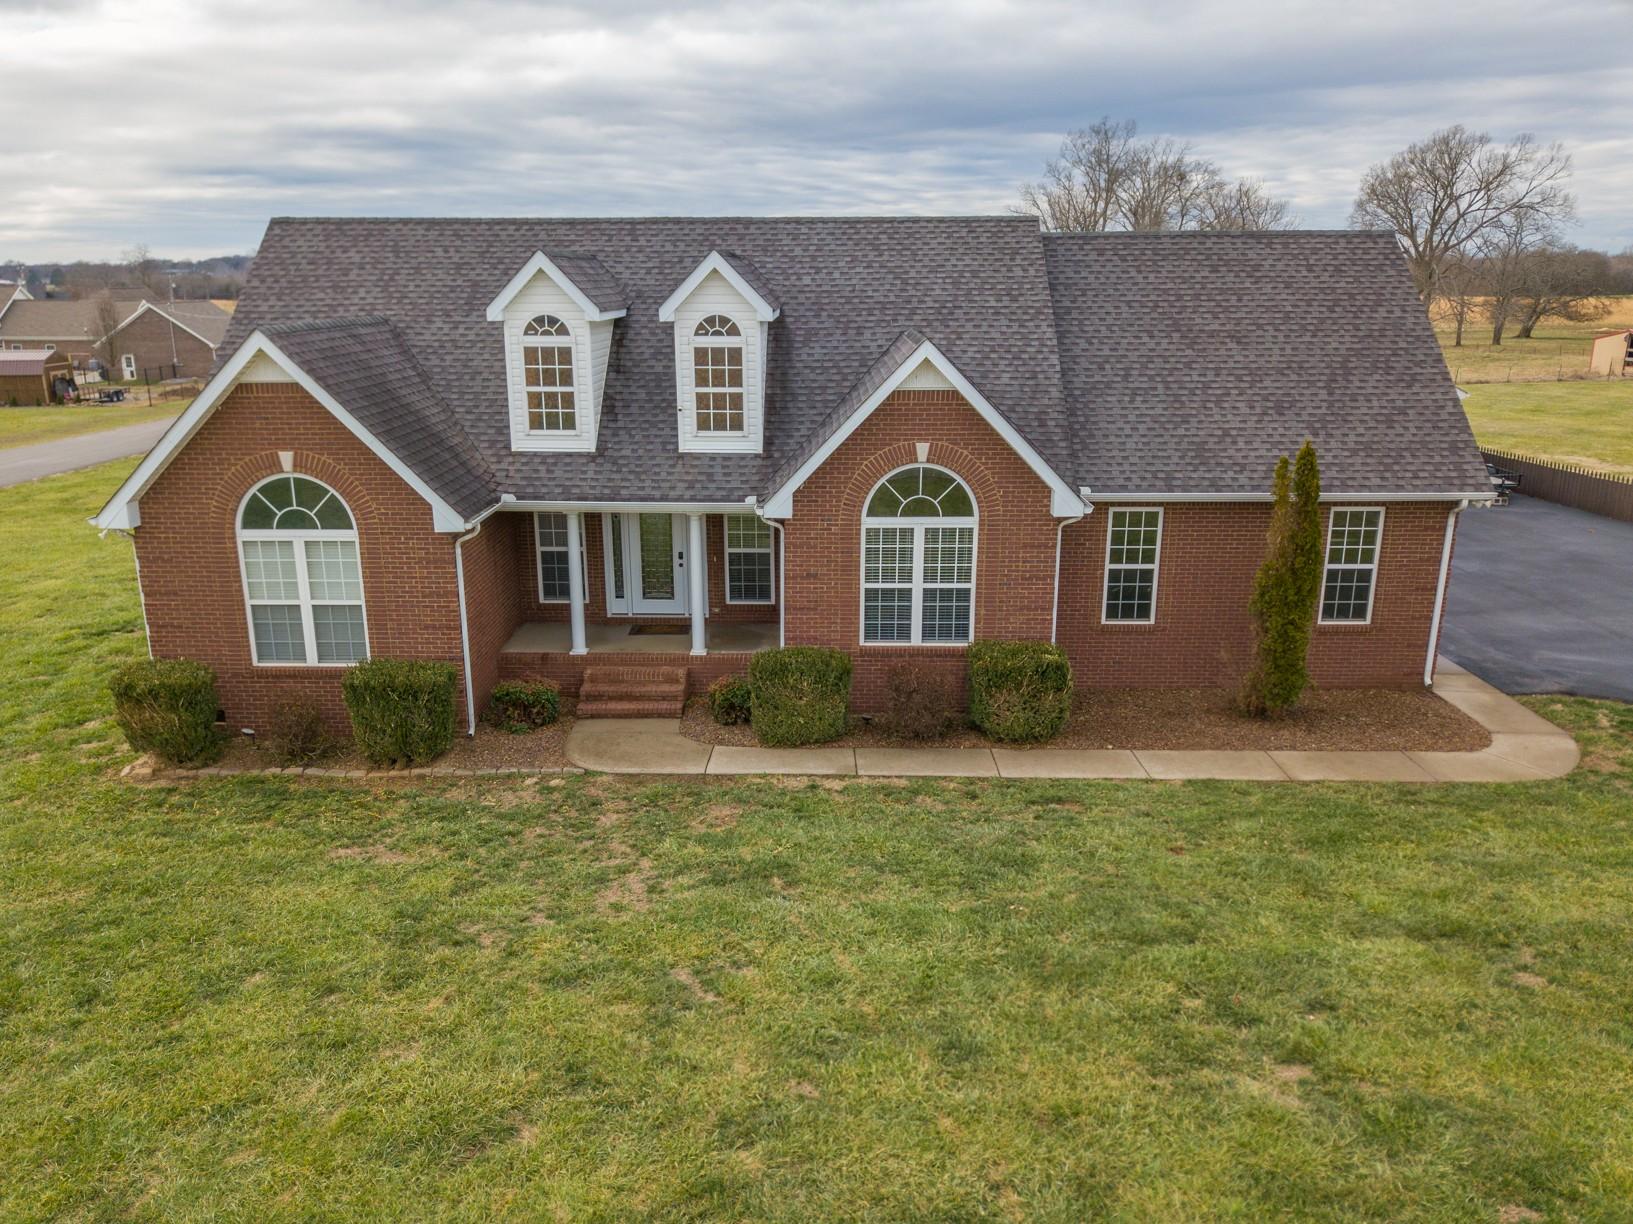 700 Coopertown Rd, Unionville, TN 37180 - Unionville, TN real estate listing